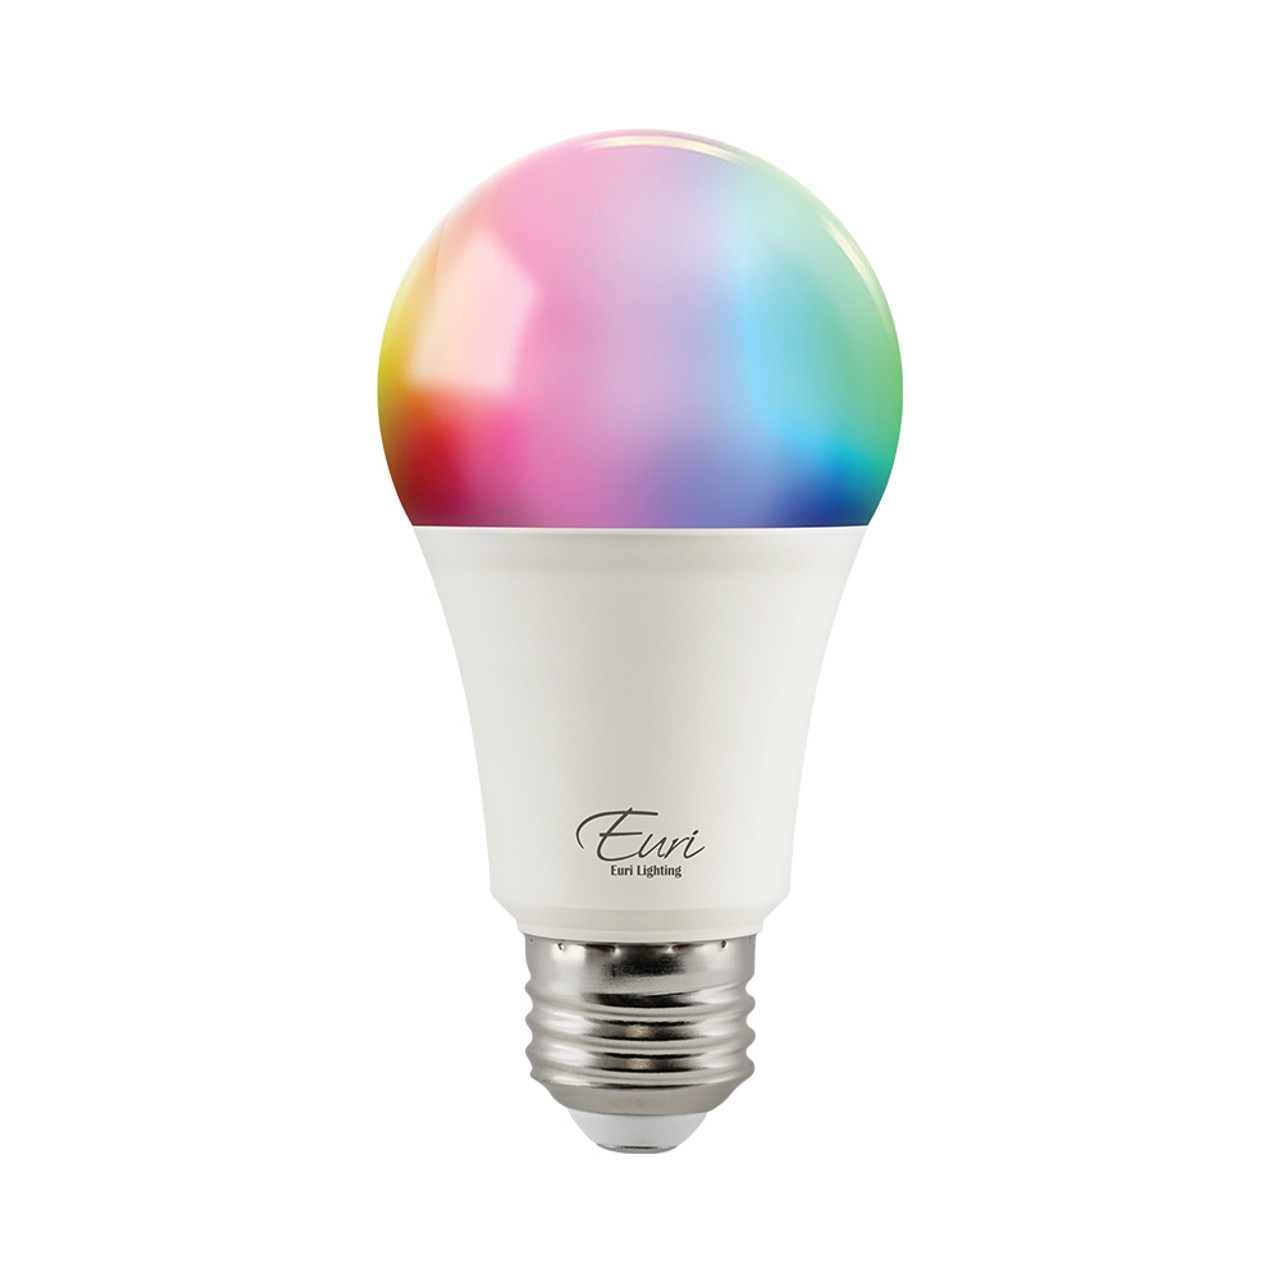 LIS, Smart LED Light Bulb, Dimmable, Multicolor, 9 W, 120 V, 810 lm, 2700K-5000K, E26 Base (LIS-A2001cec)